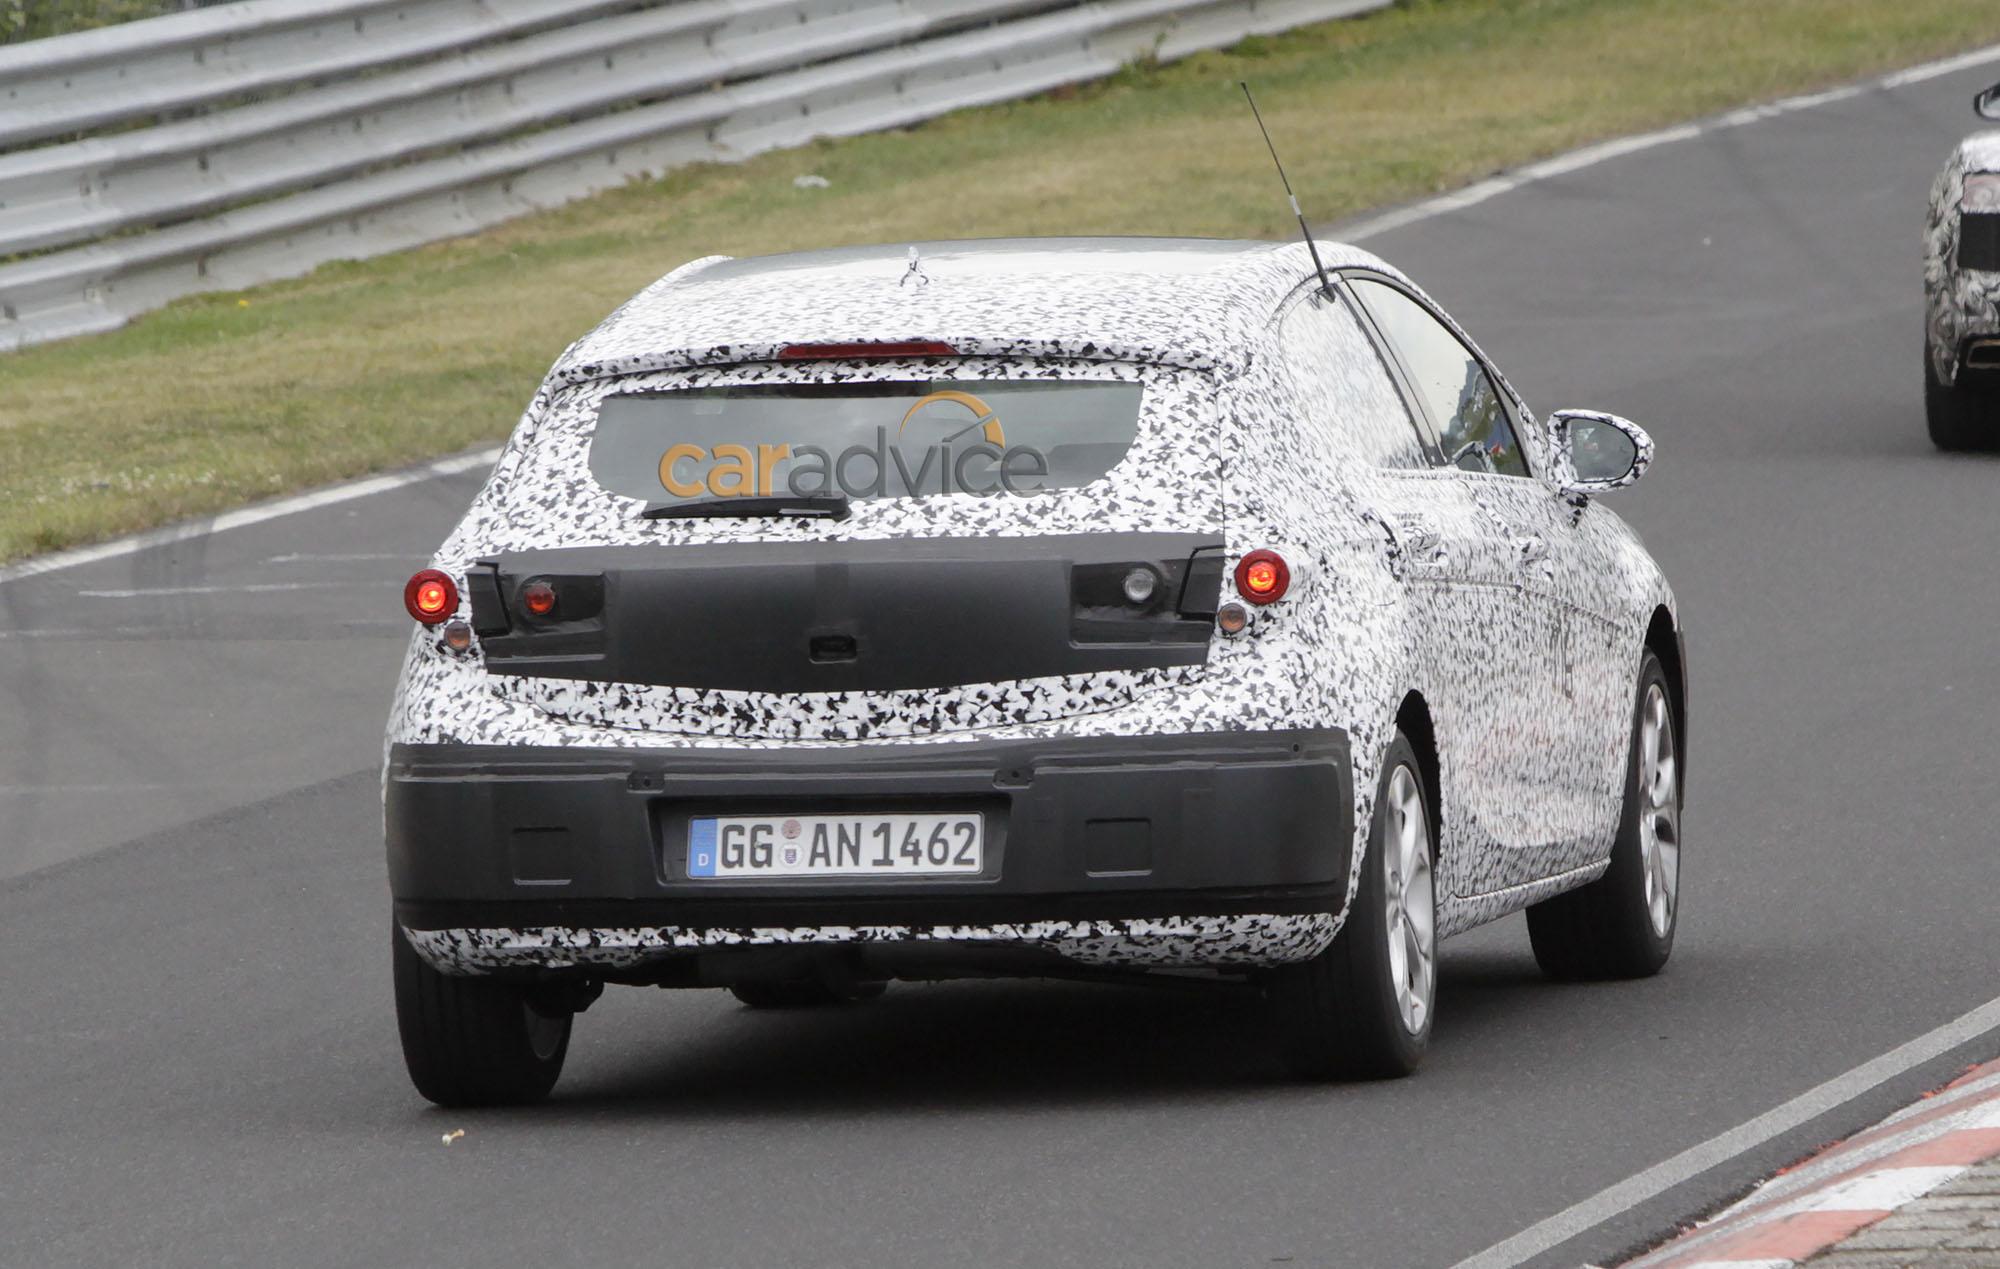 2015 Opel Astra interior spied at Nurburgring - photos ...